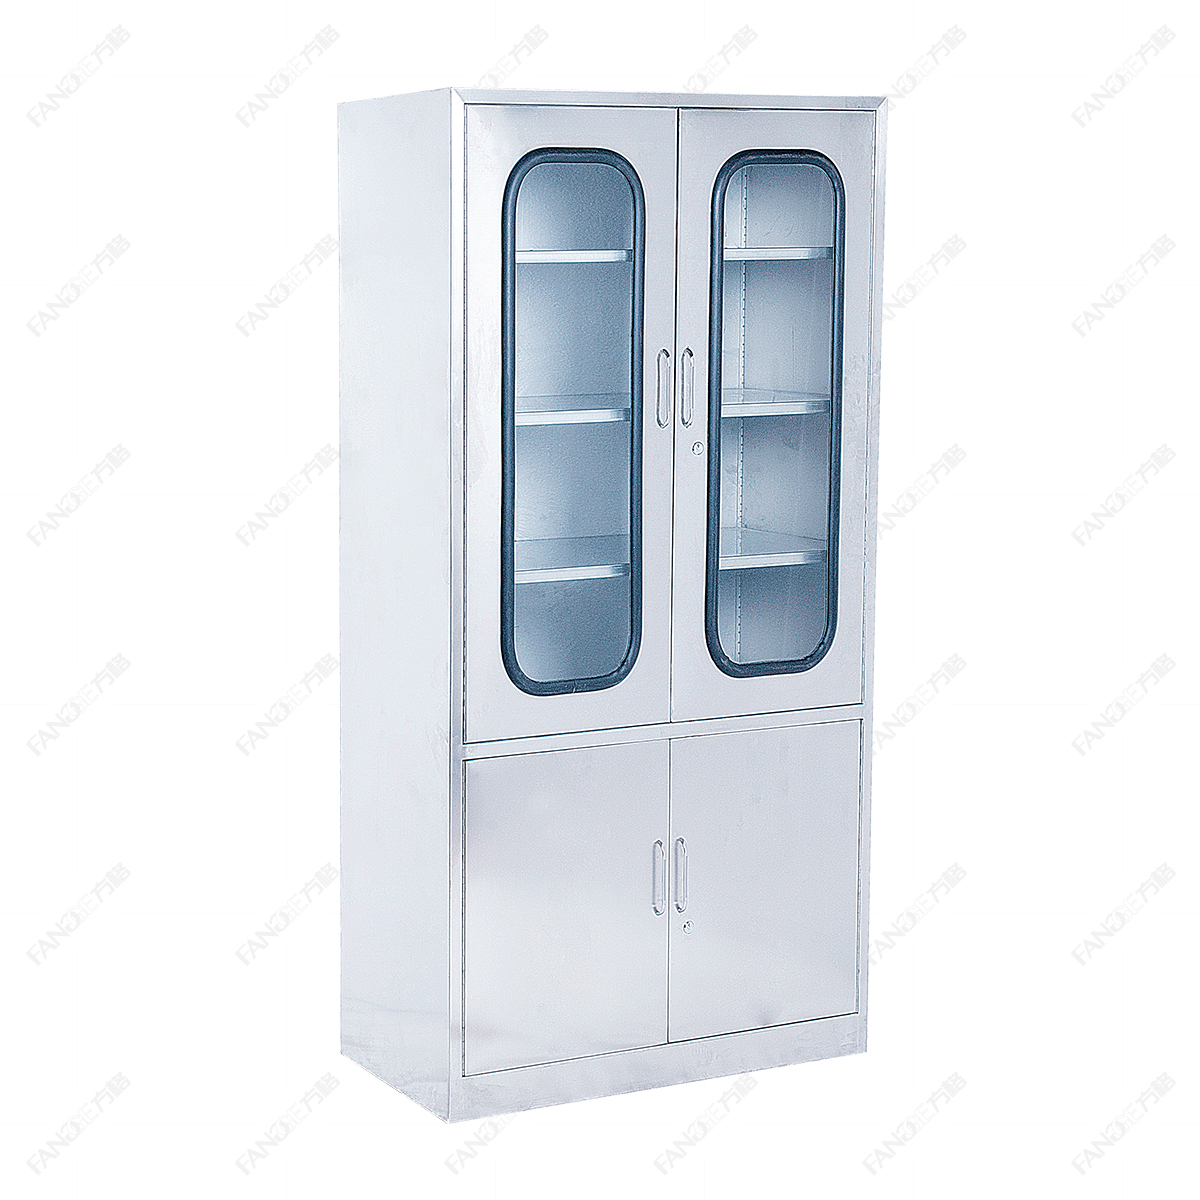 D02不锈钢器械柜